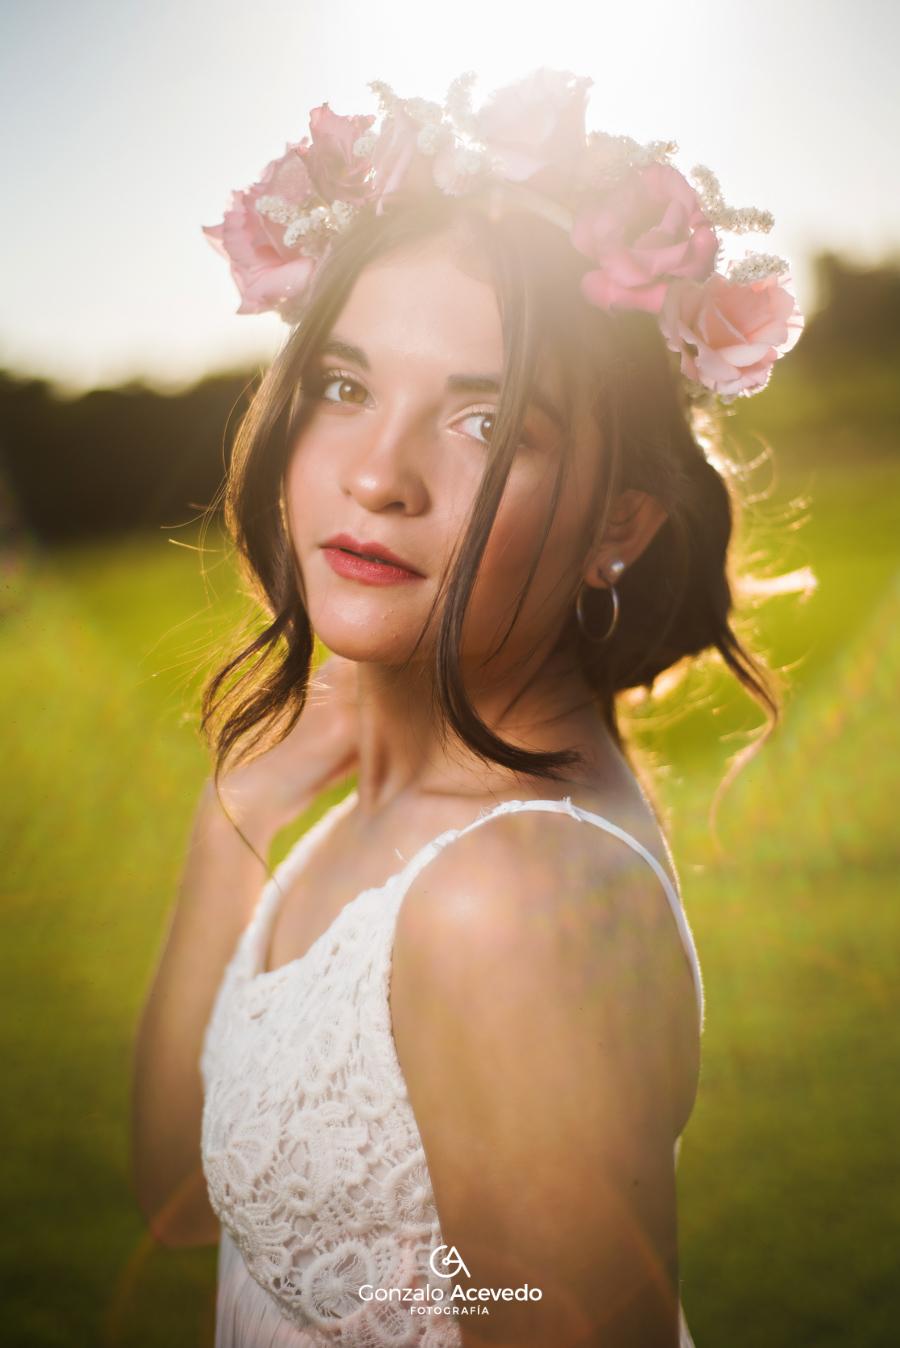 Book de campo al aire libre con corona de flores Gonzalo Acevedo